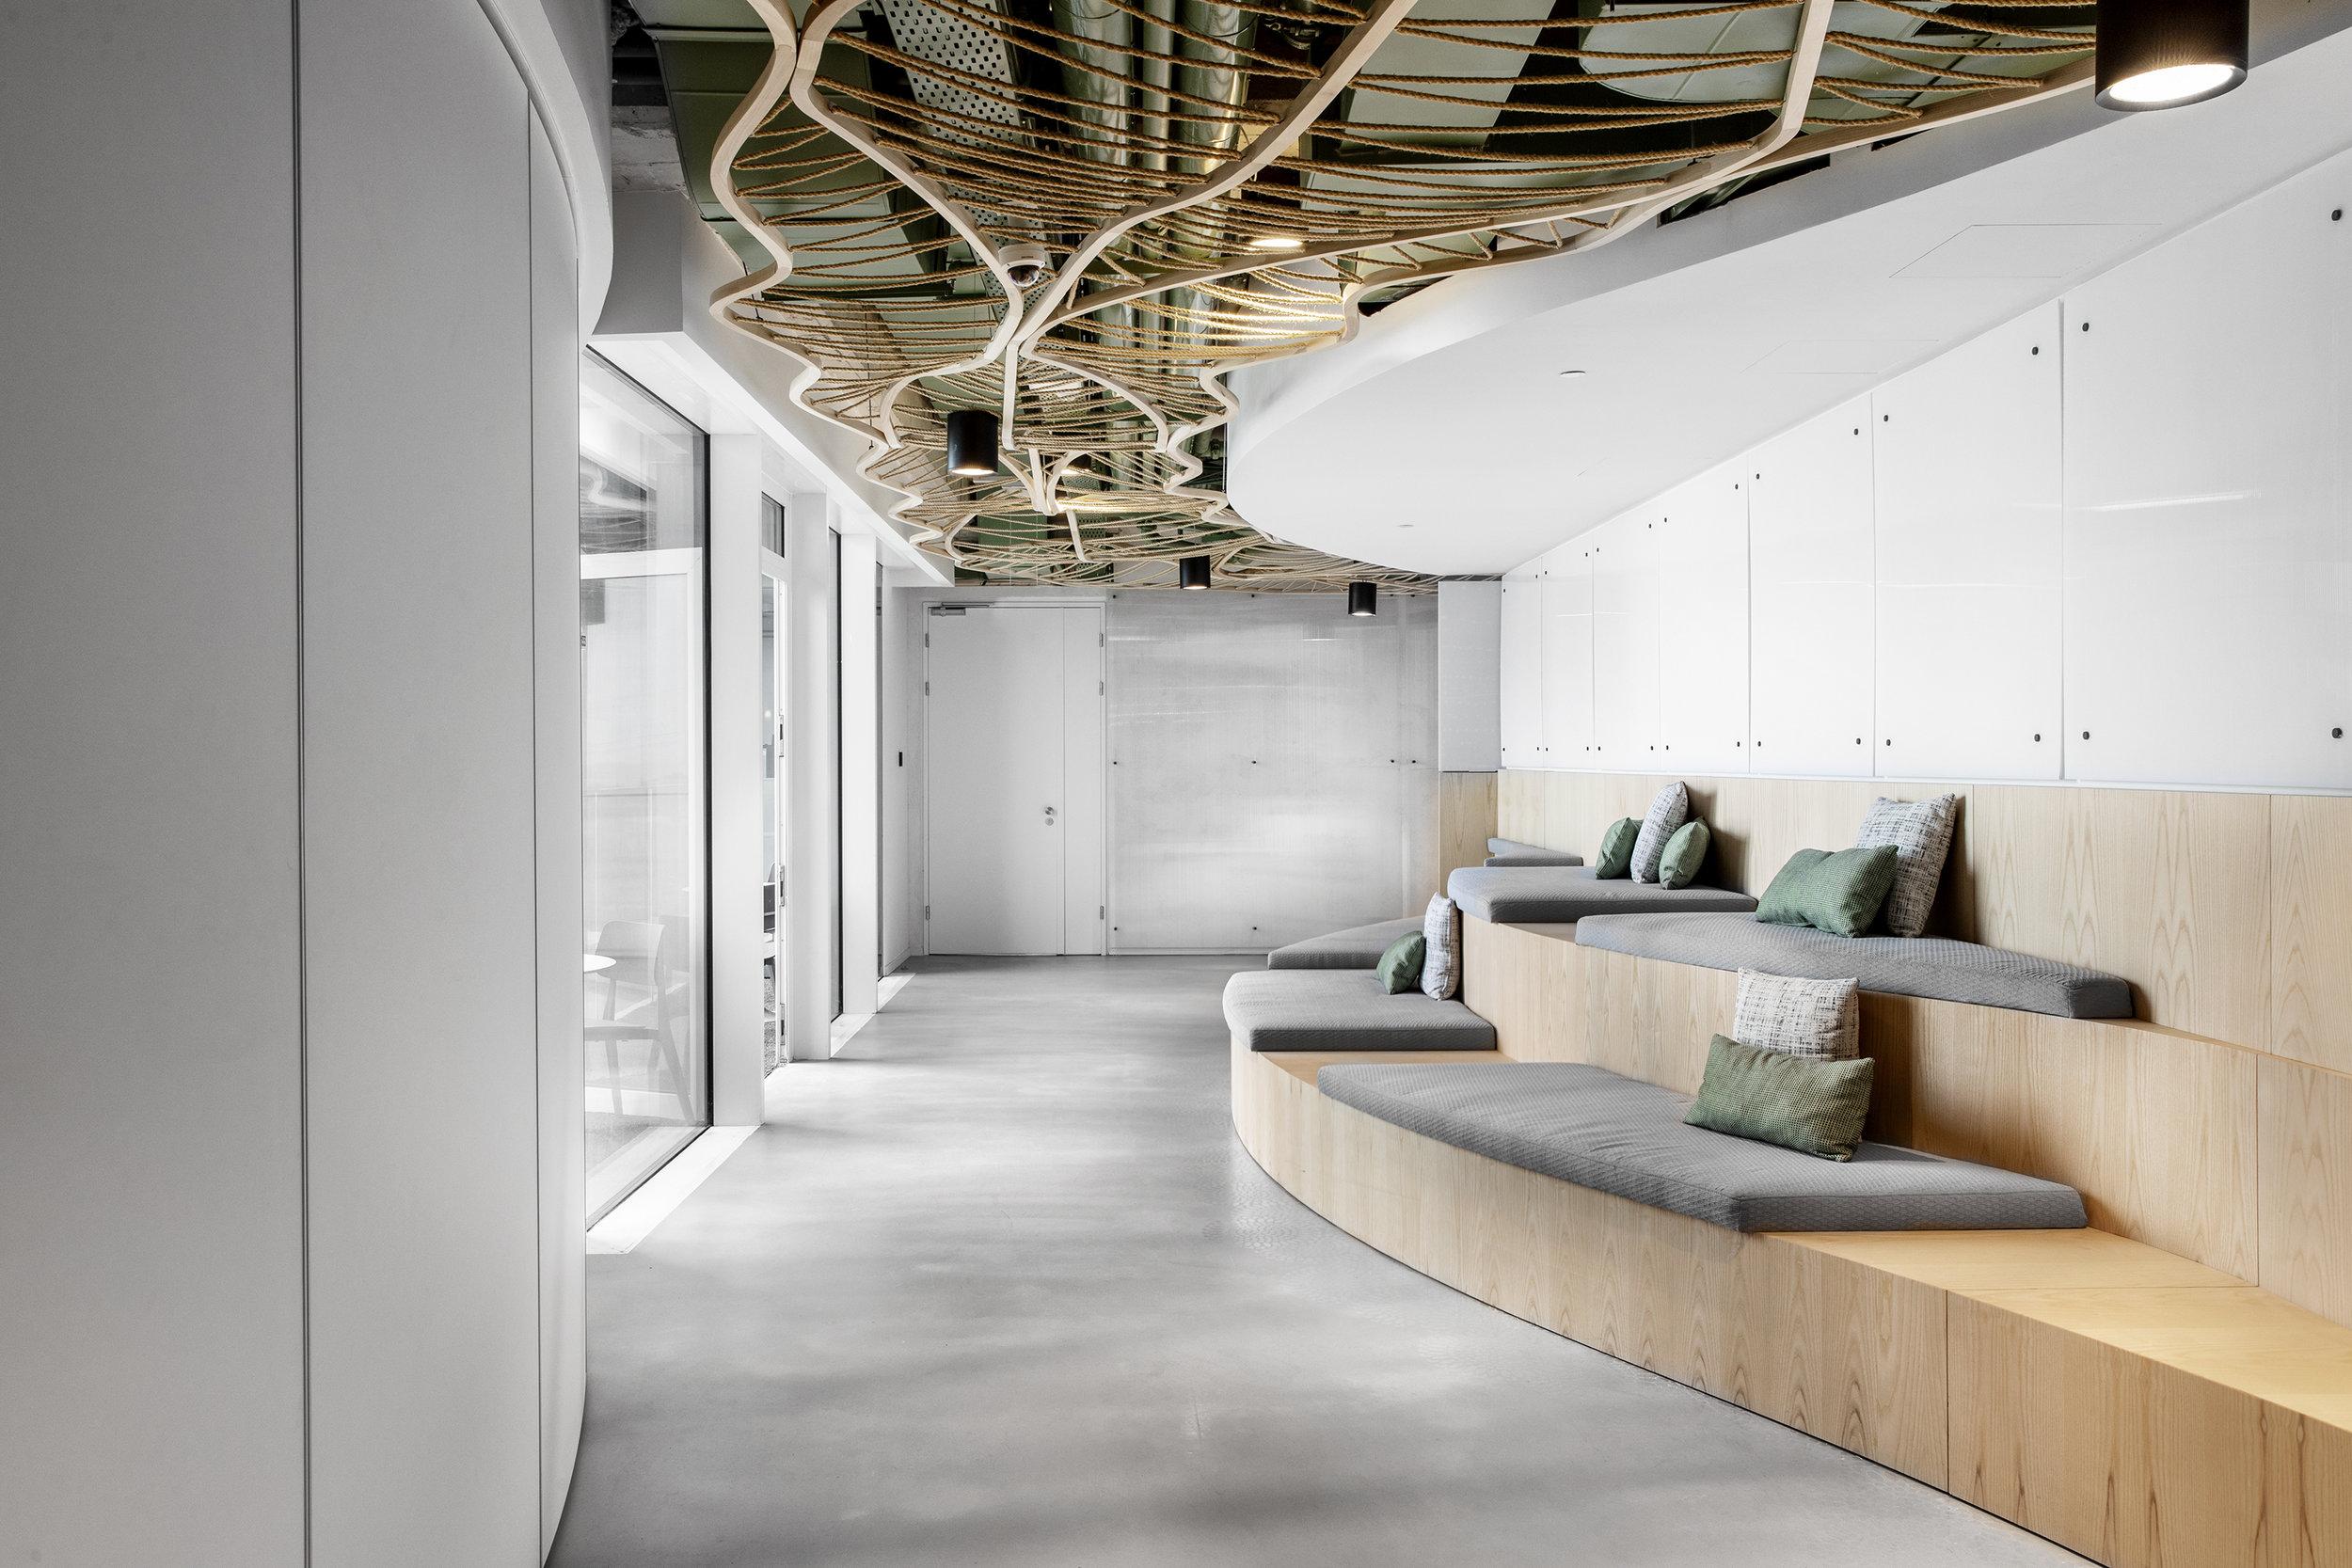 HINNOMAN - ROY DAVID ARCHTECTURE - STUDIO - סטודיו רואי דוד - אדריכלים (44).jpg